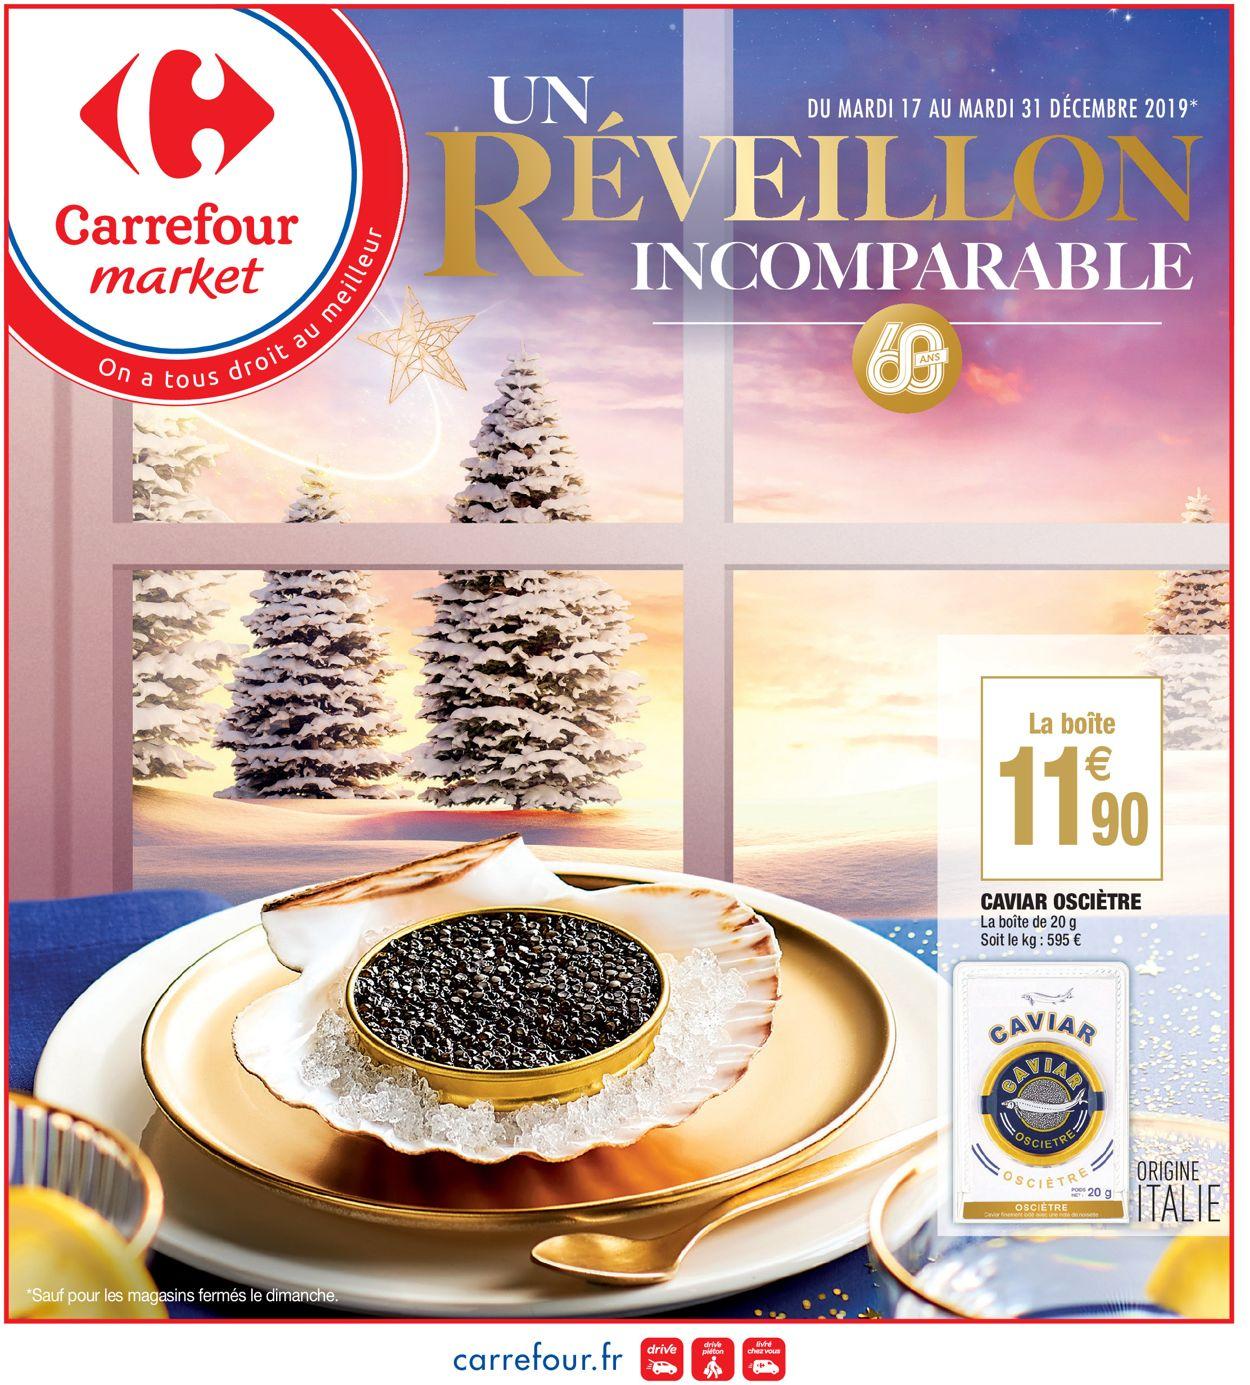 Carrefour - catalogue de Noël 2019 Catalogue - 17.12-31.12.2019